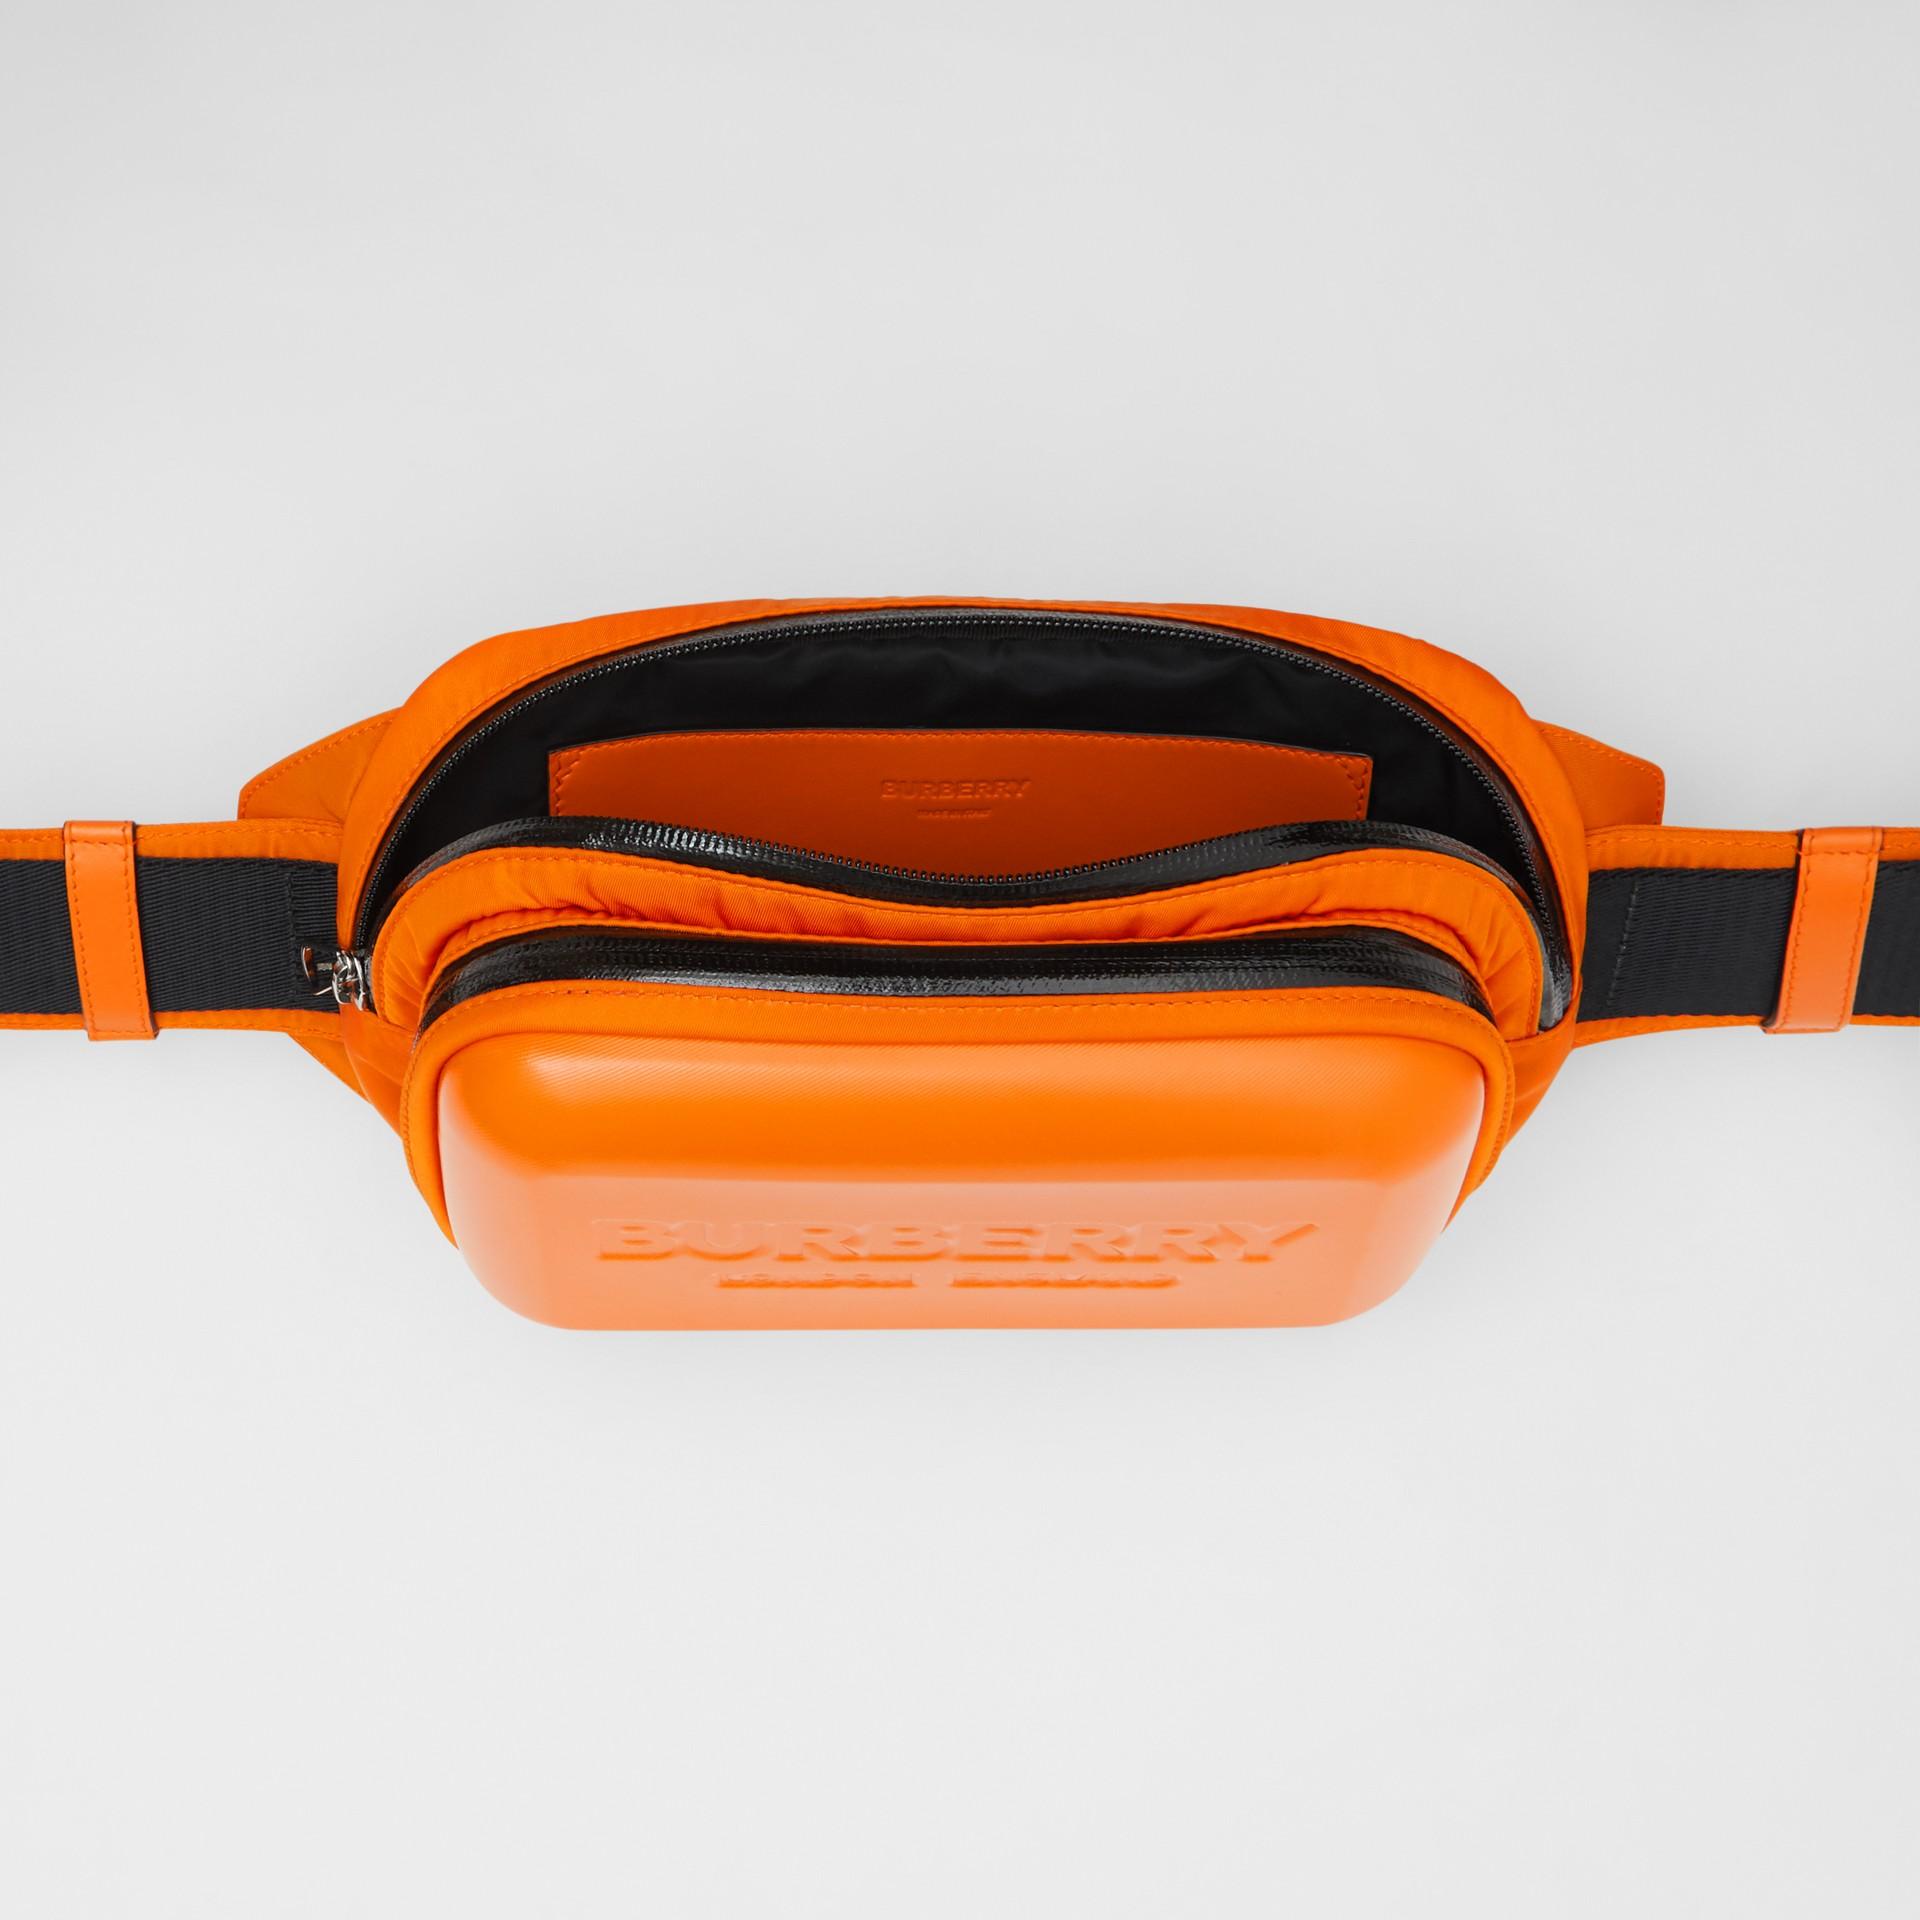 Logo Embossed Panel Nylon Bum Bag in Bright Orange - Men | Burberry United Kingdom - gallery image 3